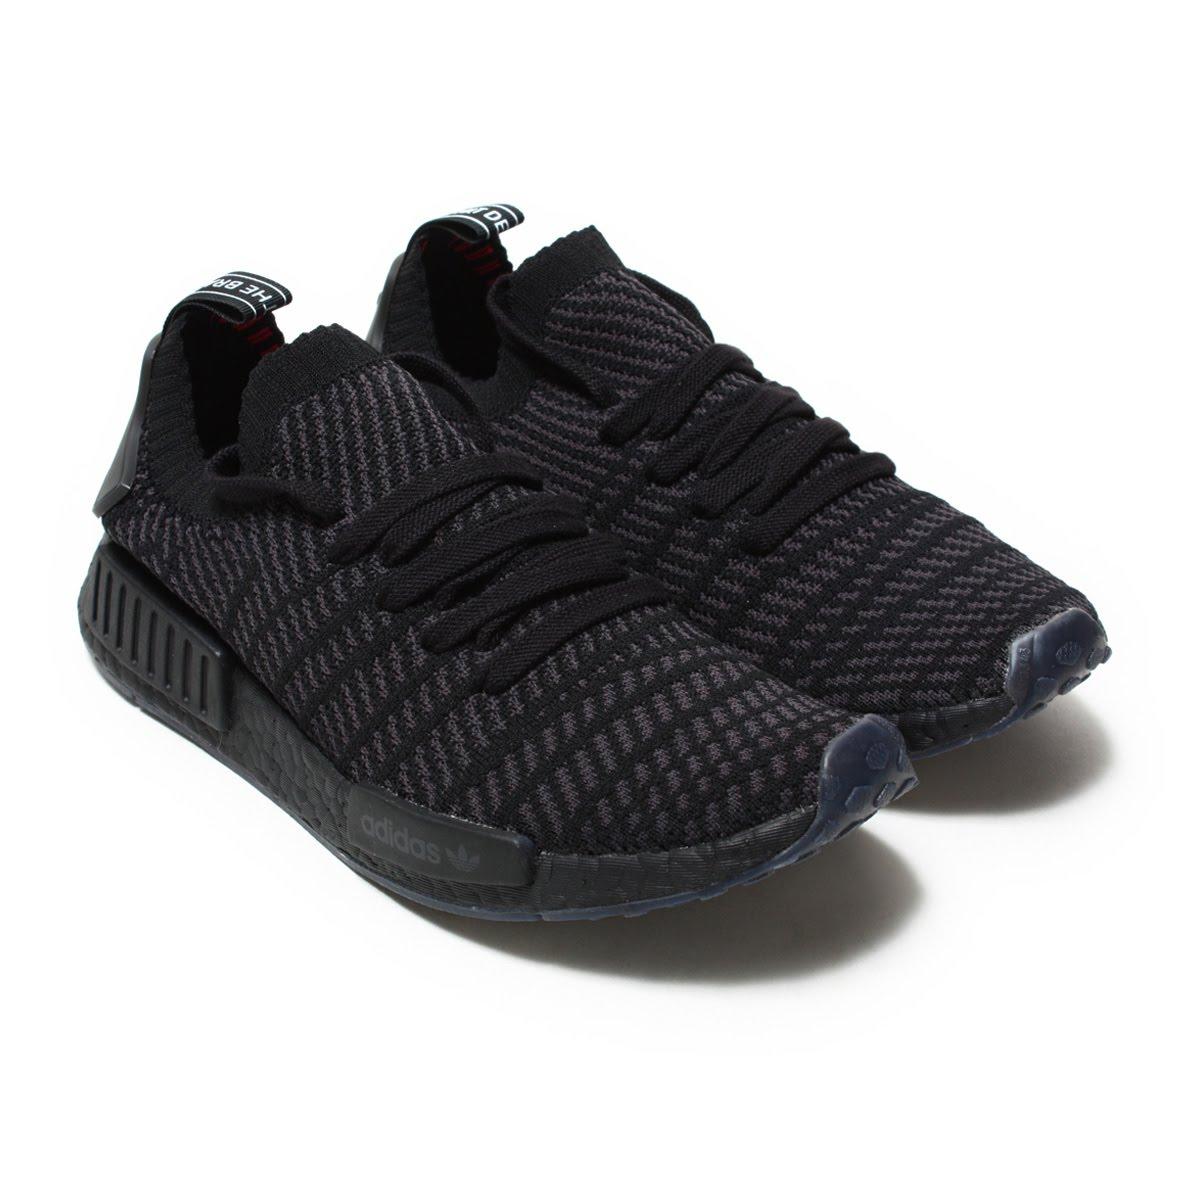 adidas Originals NMD_R1 STLT PK(アディダス オリジナルス エヌエムディー R1 STLT PK)Core Black/Utility Black/Solar Pink【メンズ スニーカー】18SS-I